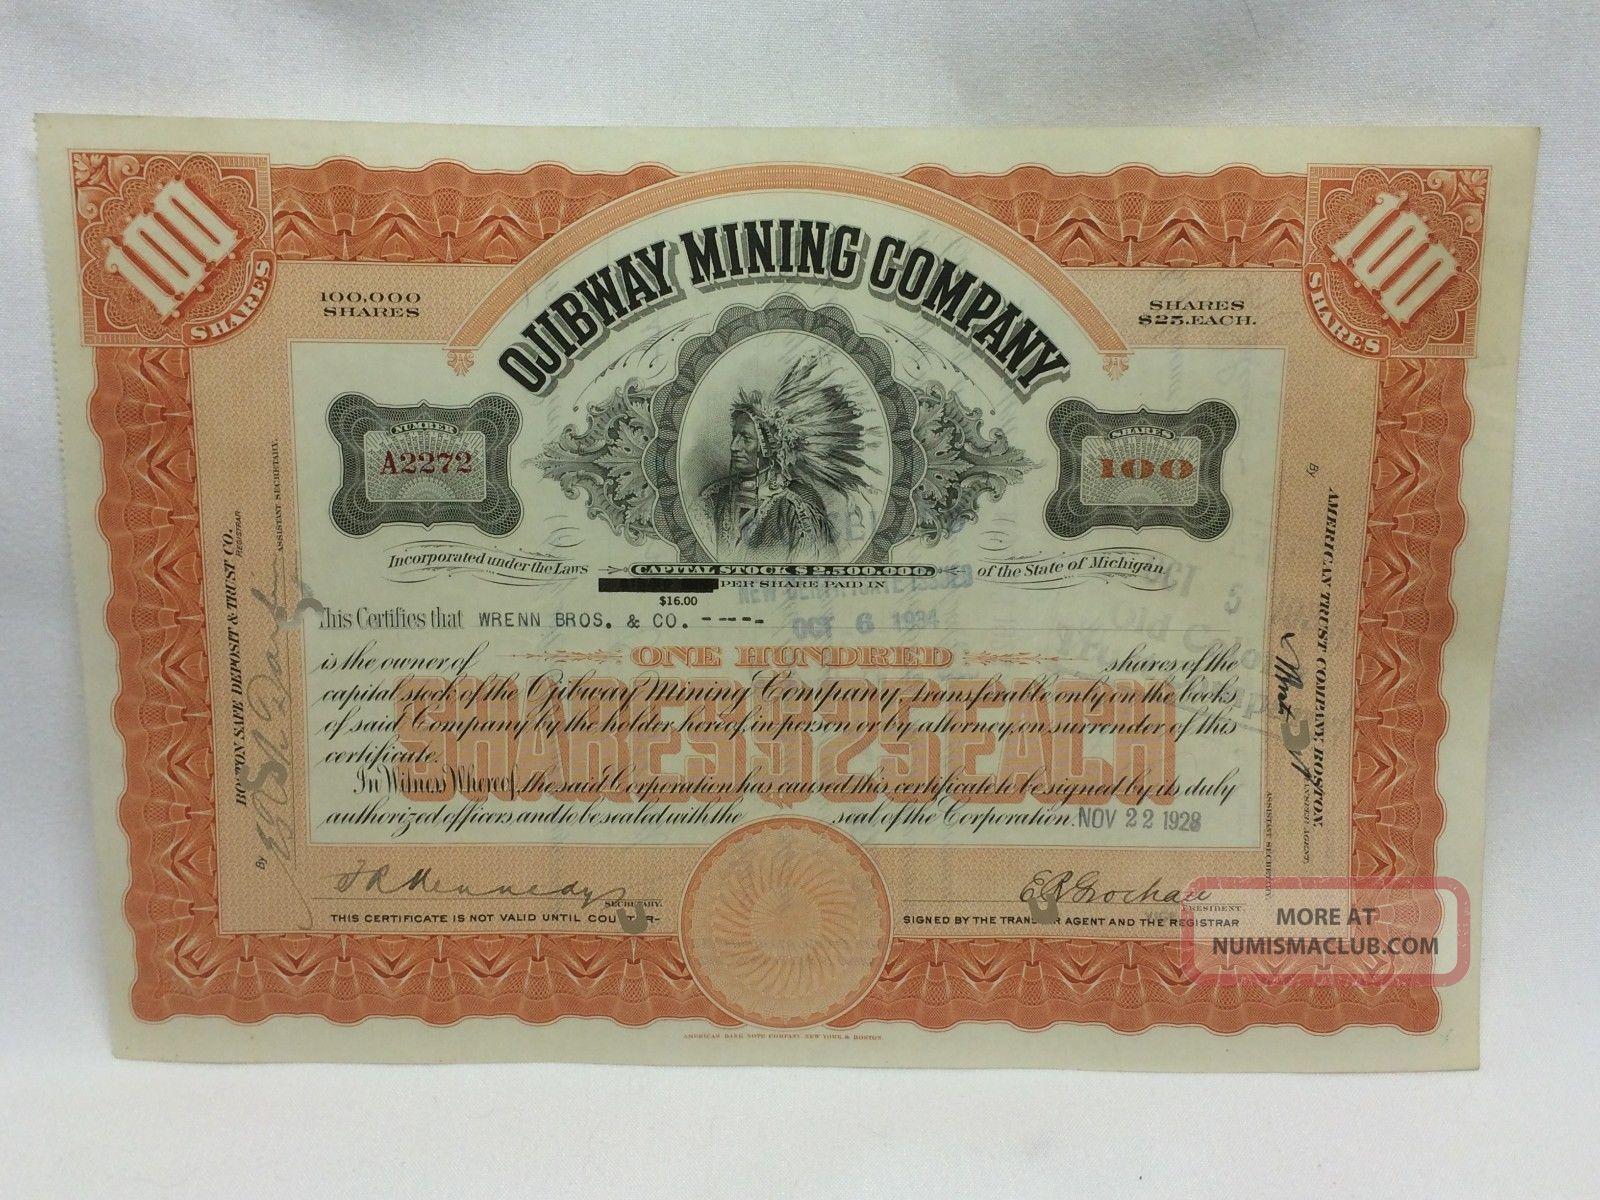 Ojibway Mining Company Stock Certificate 100 Shares Michigan Abnc Issued 1928 Stocks & Bonds, Scripophily photo